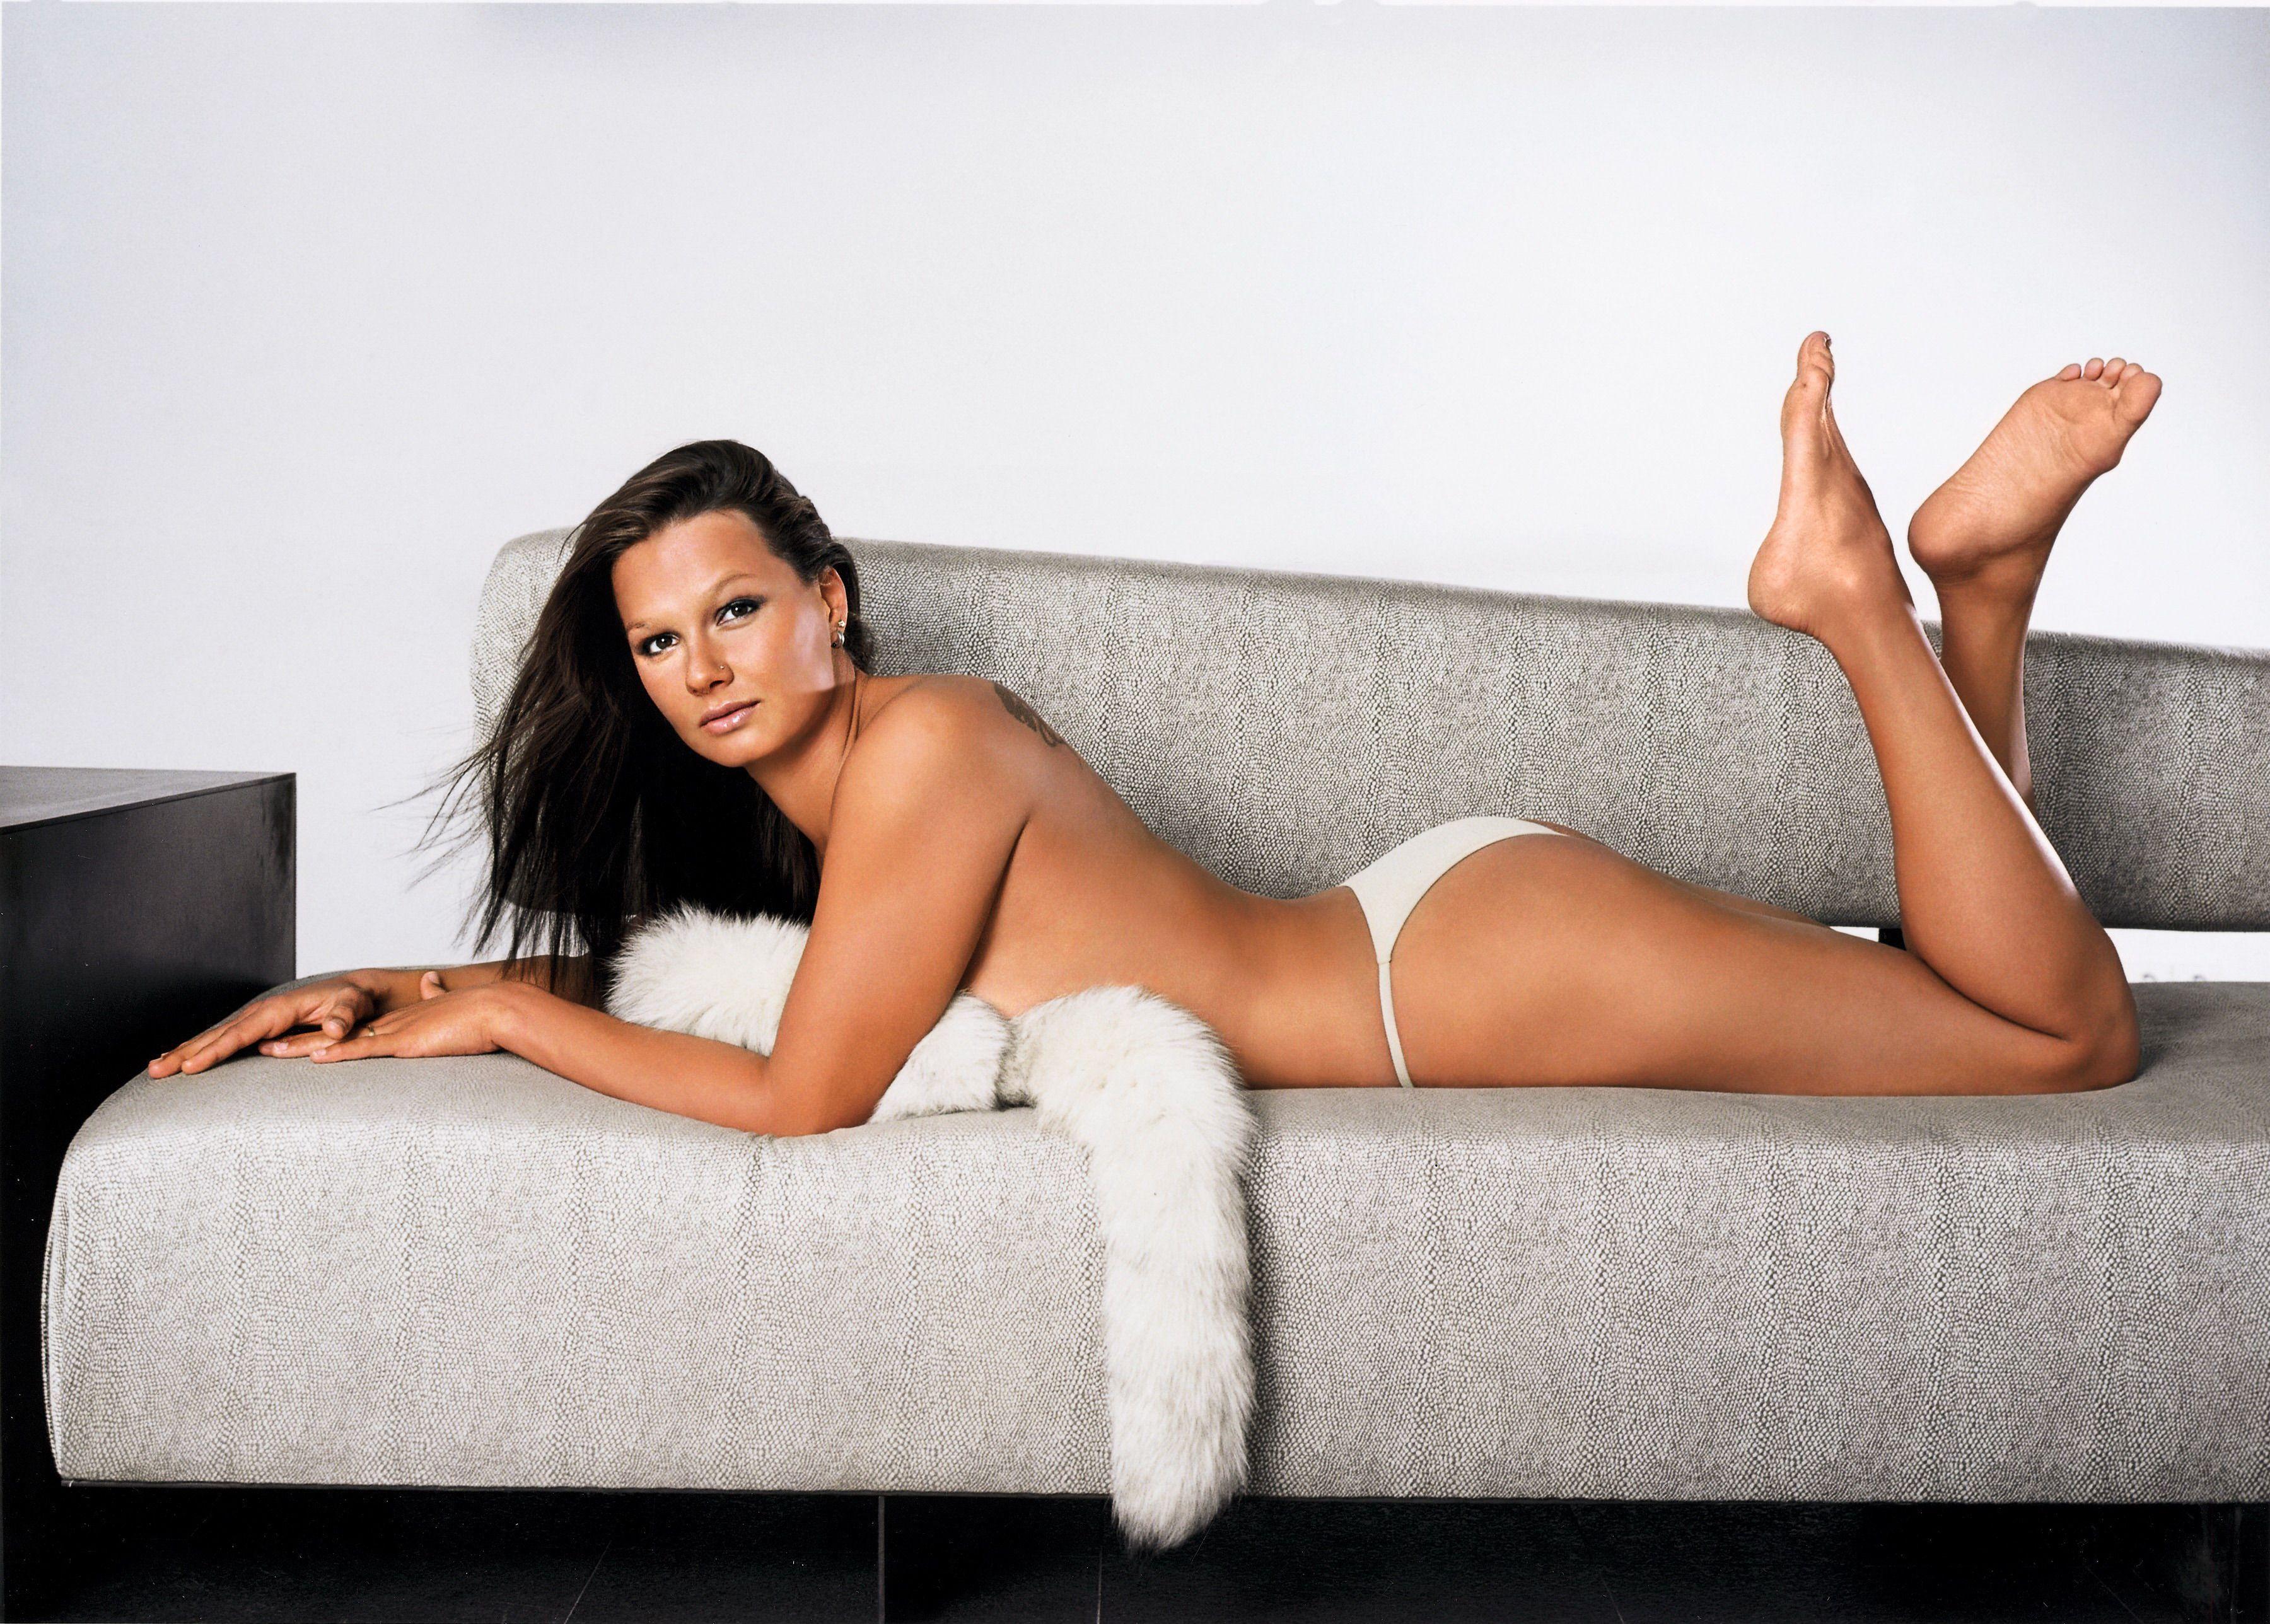 Franziska van almsick sexy